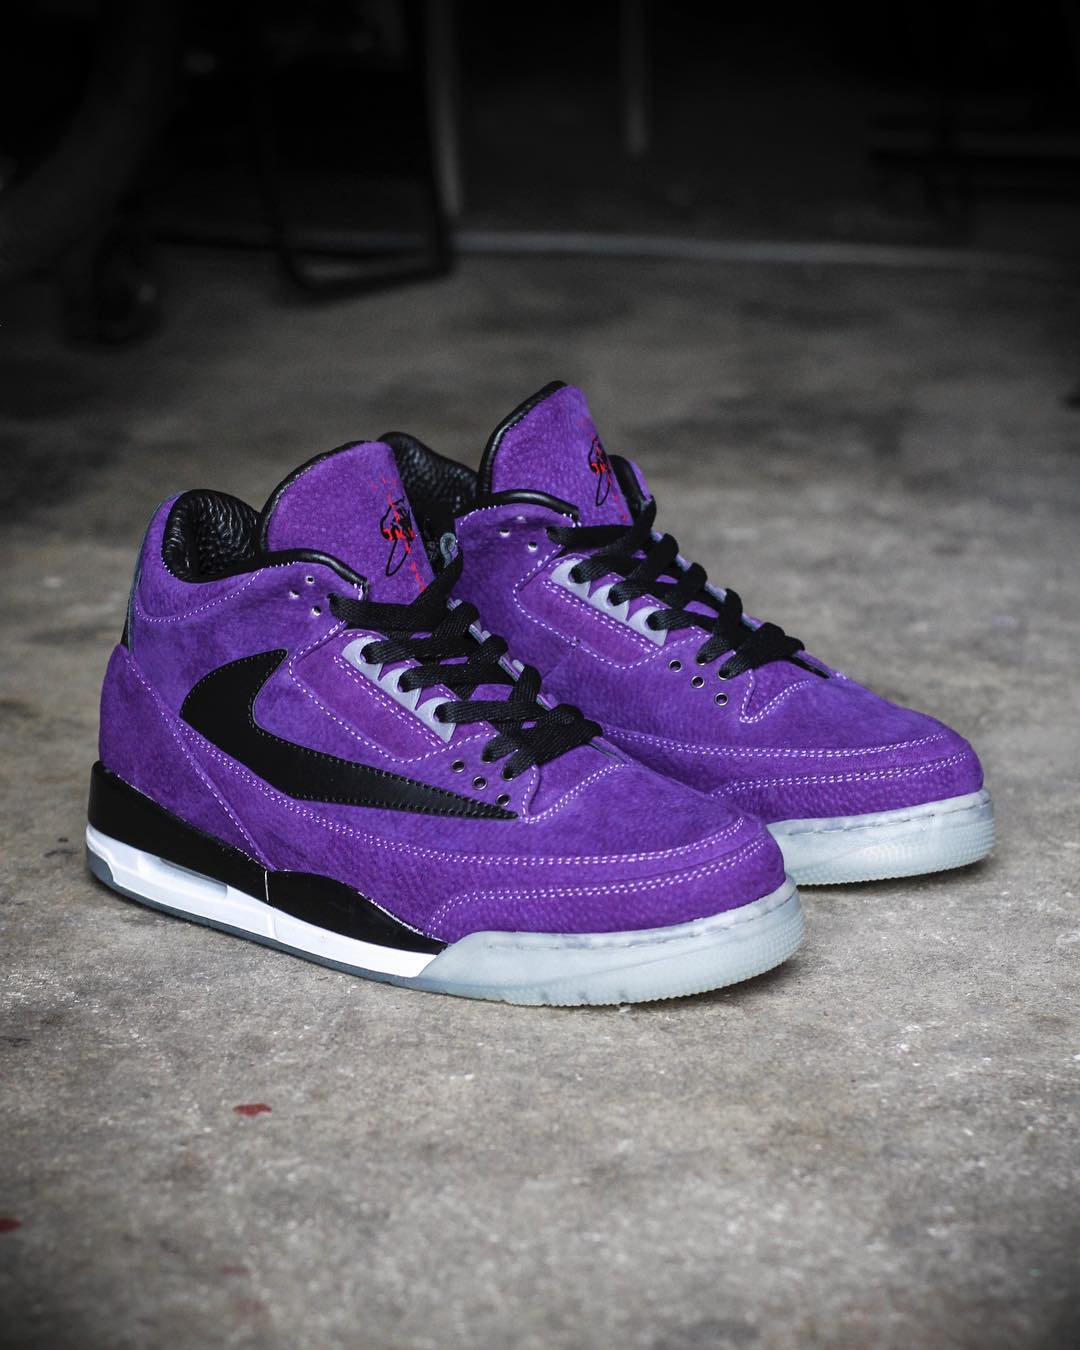 OFF-WHITE,Air Jordan 11,潮鞋,莆田鞋,精仿鞋,高仿鞋